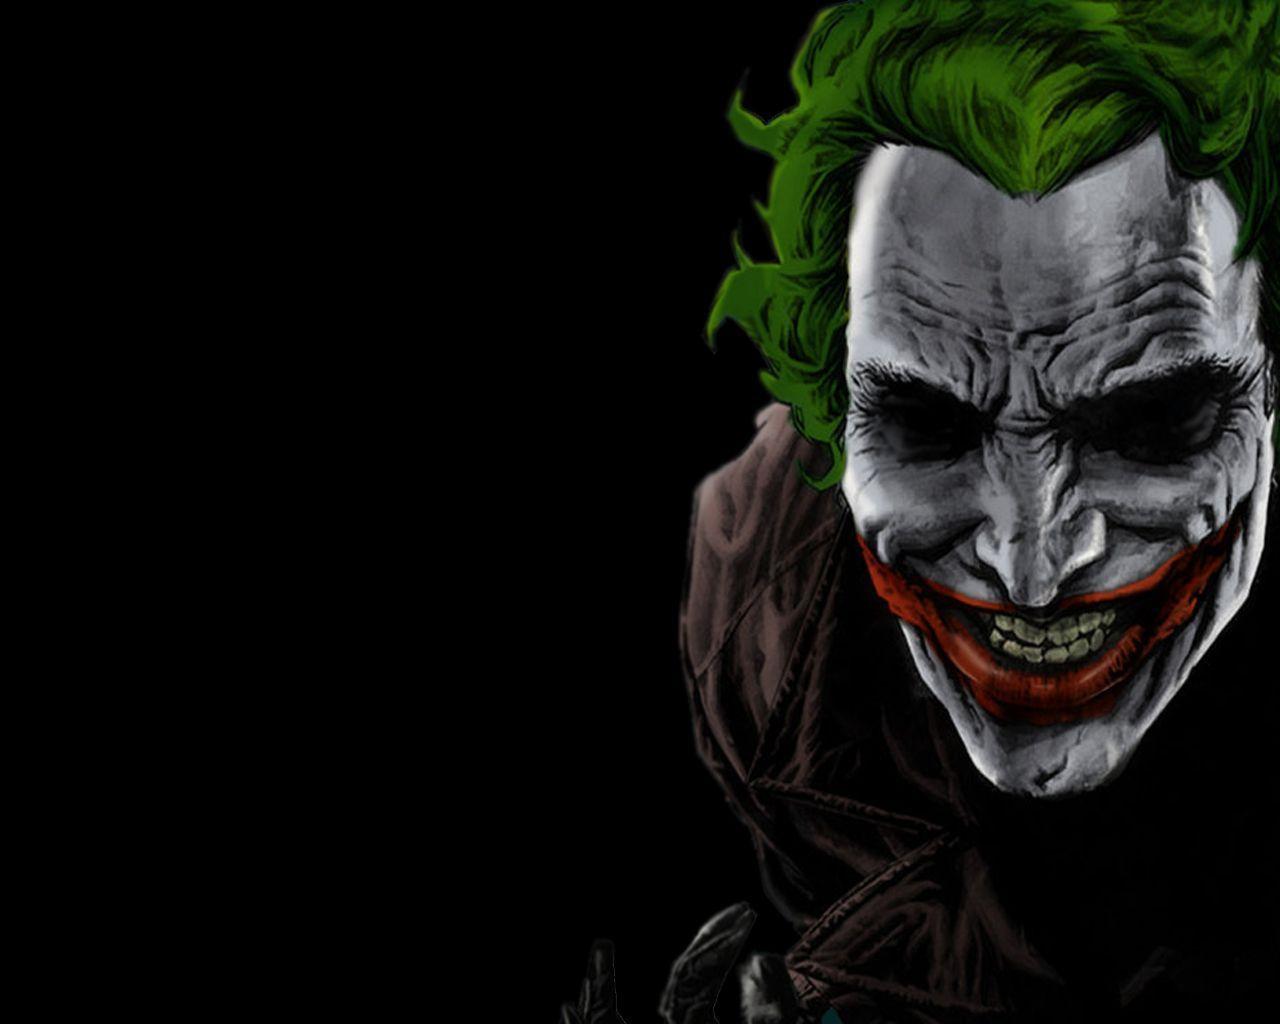 Joker Why So Serious Drawings Wallpaper Widescreen Cool HD